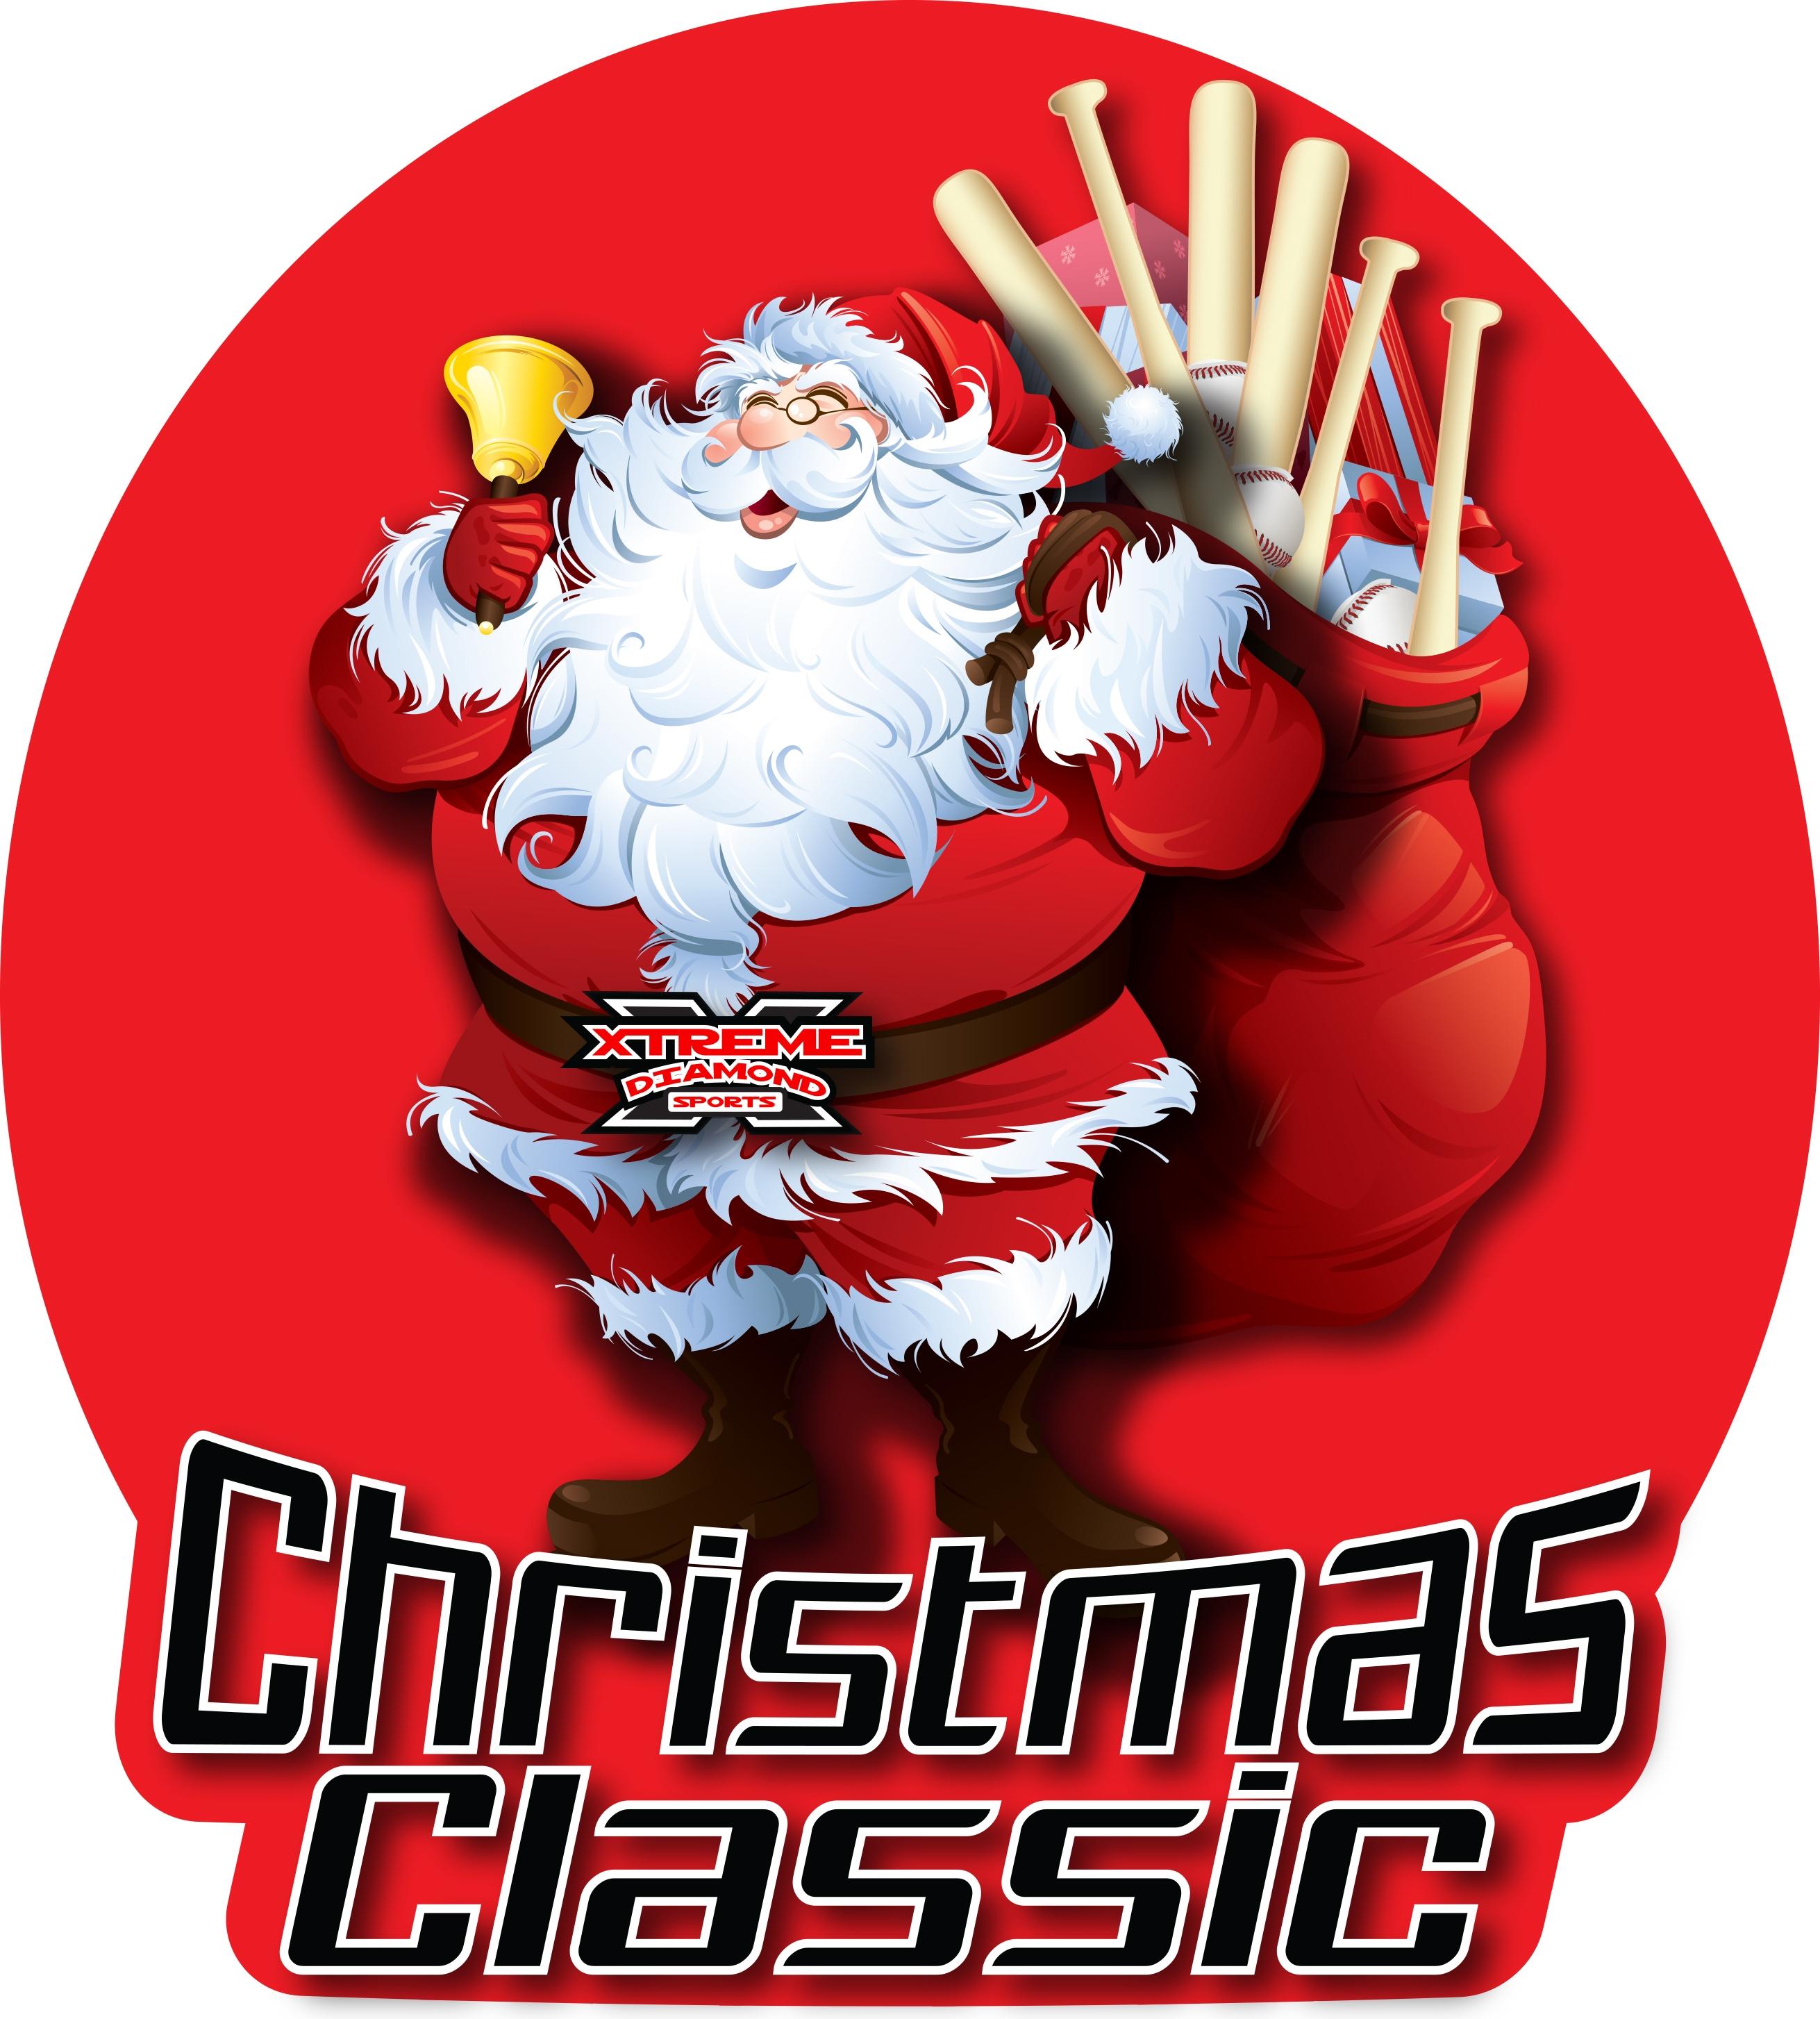 National Championship Sports Baseball Xtreme Diamond Ncs Christmas Classic East Valley Events 14u 18u Is Wood Bats Zinger Bats